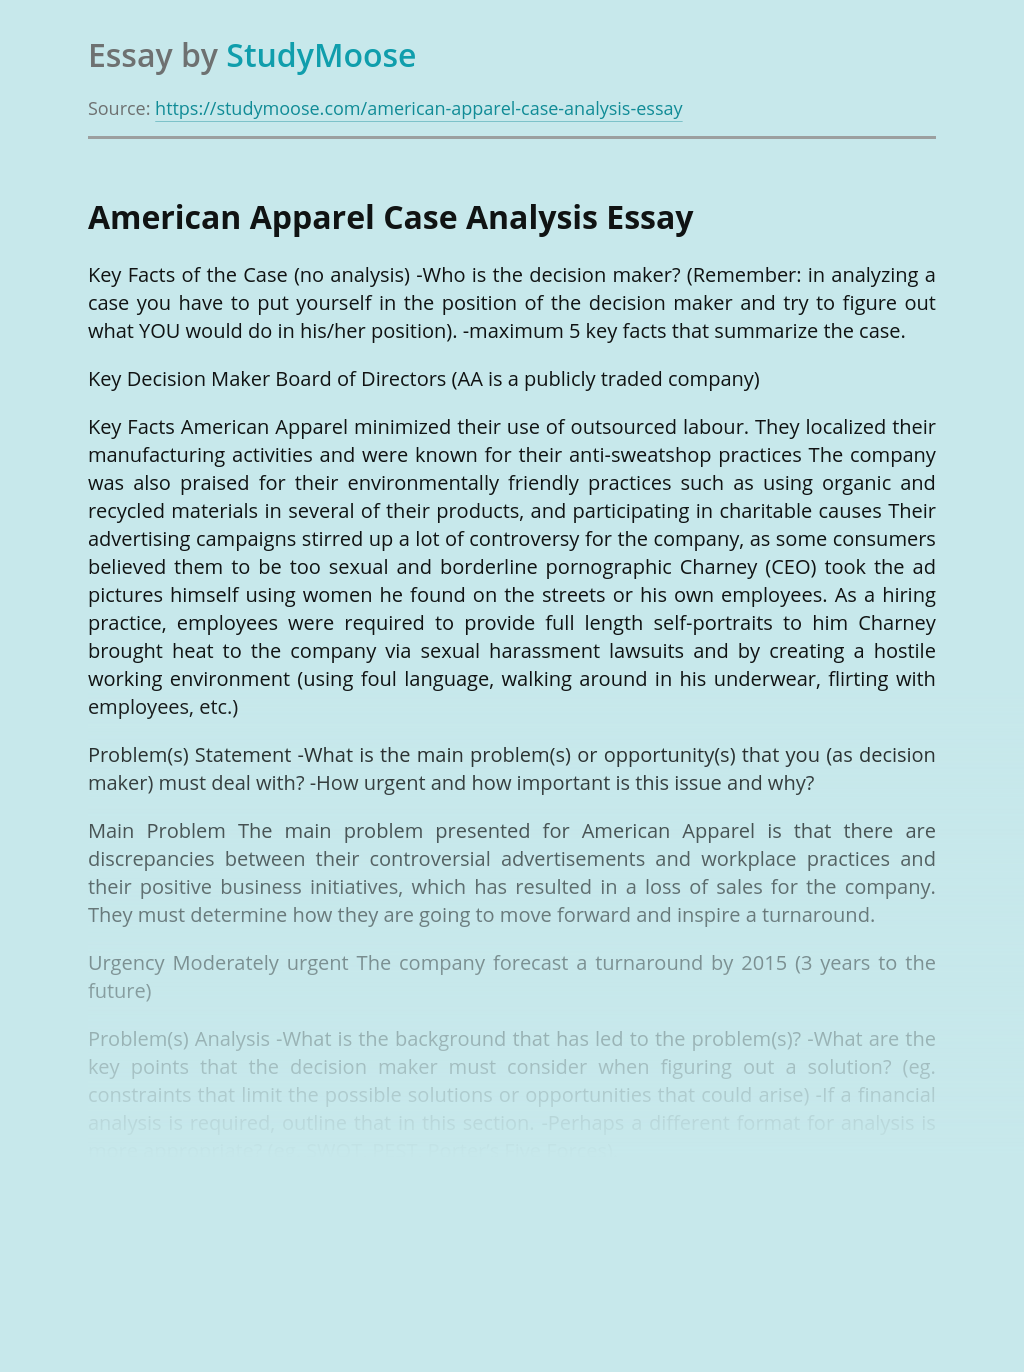 American Apparel Case Analysis